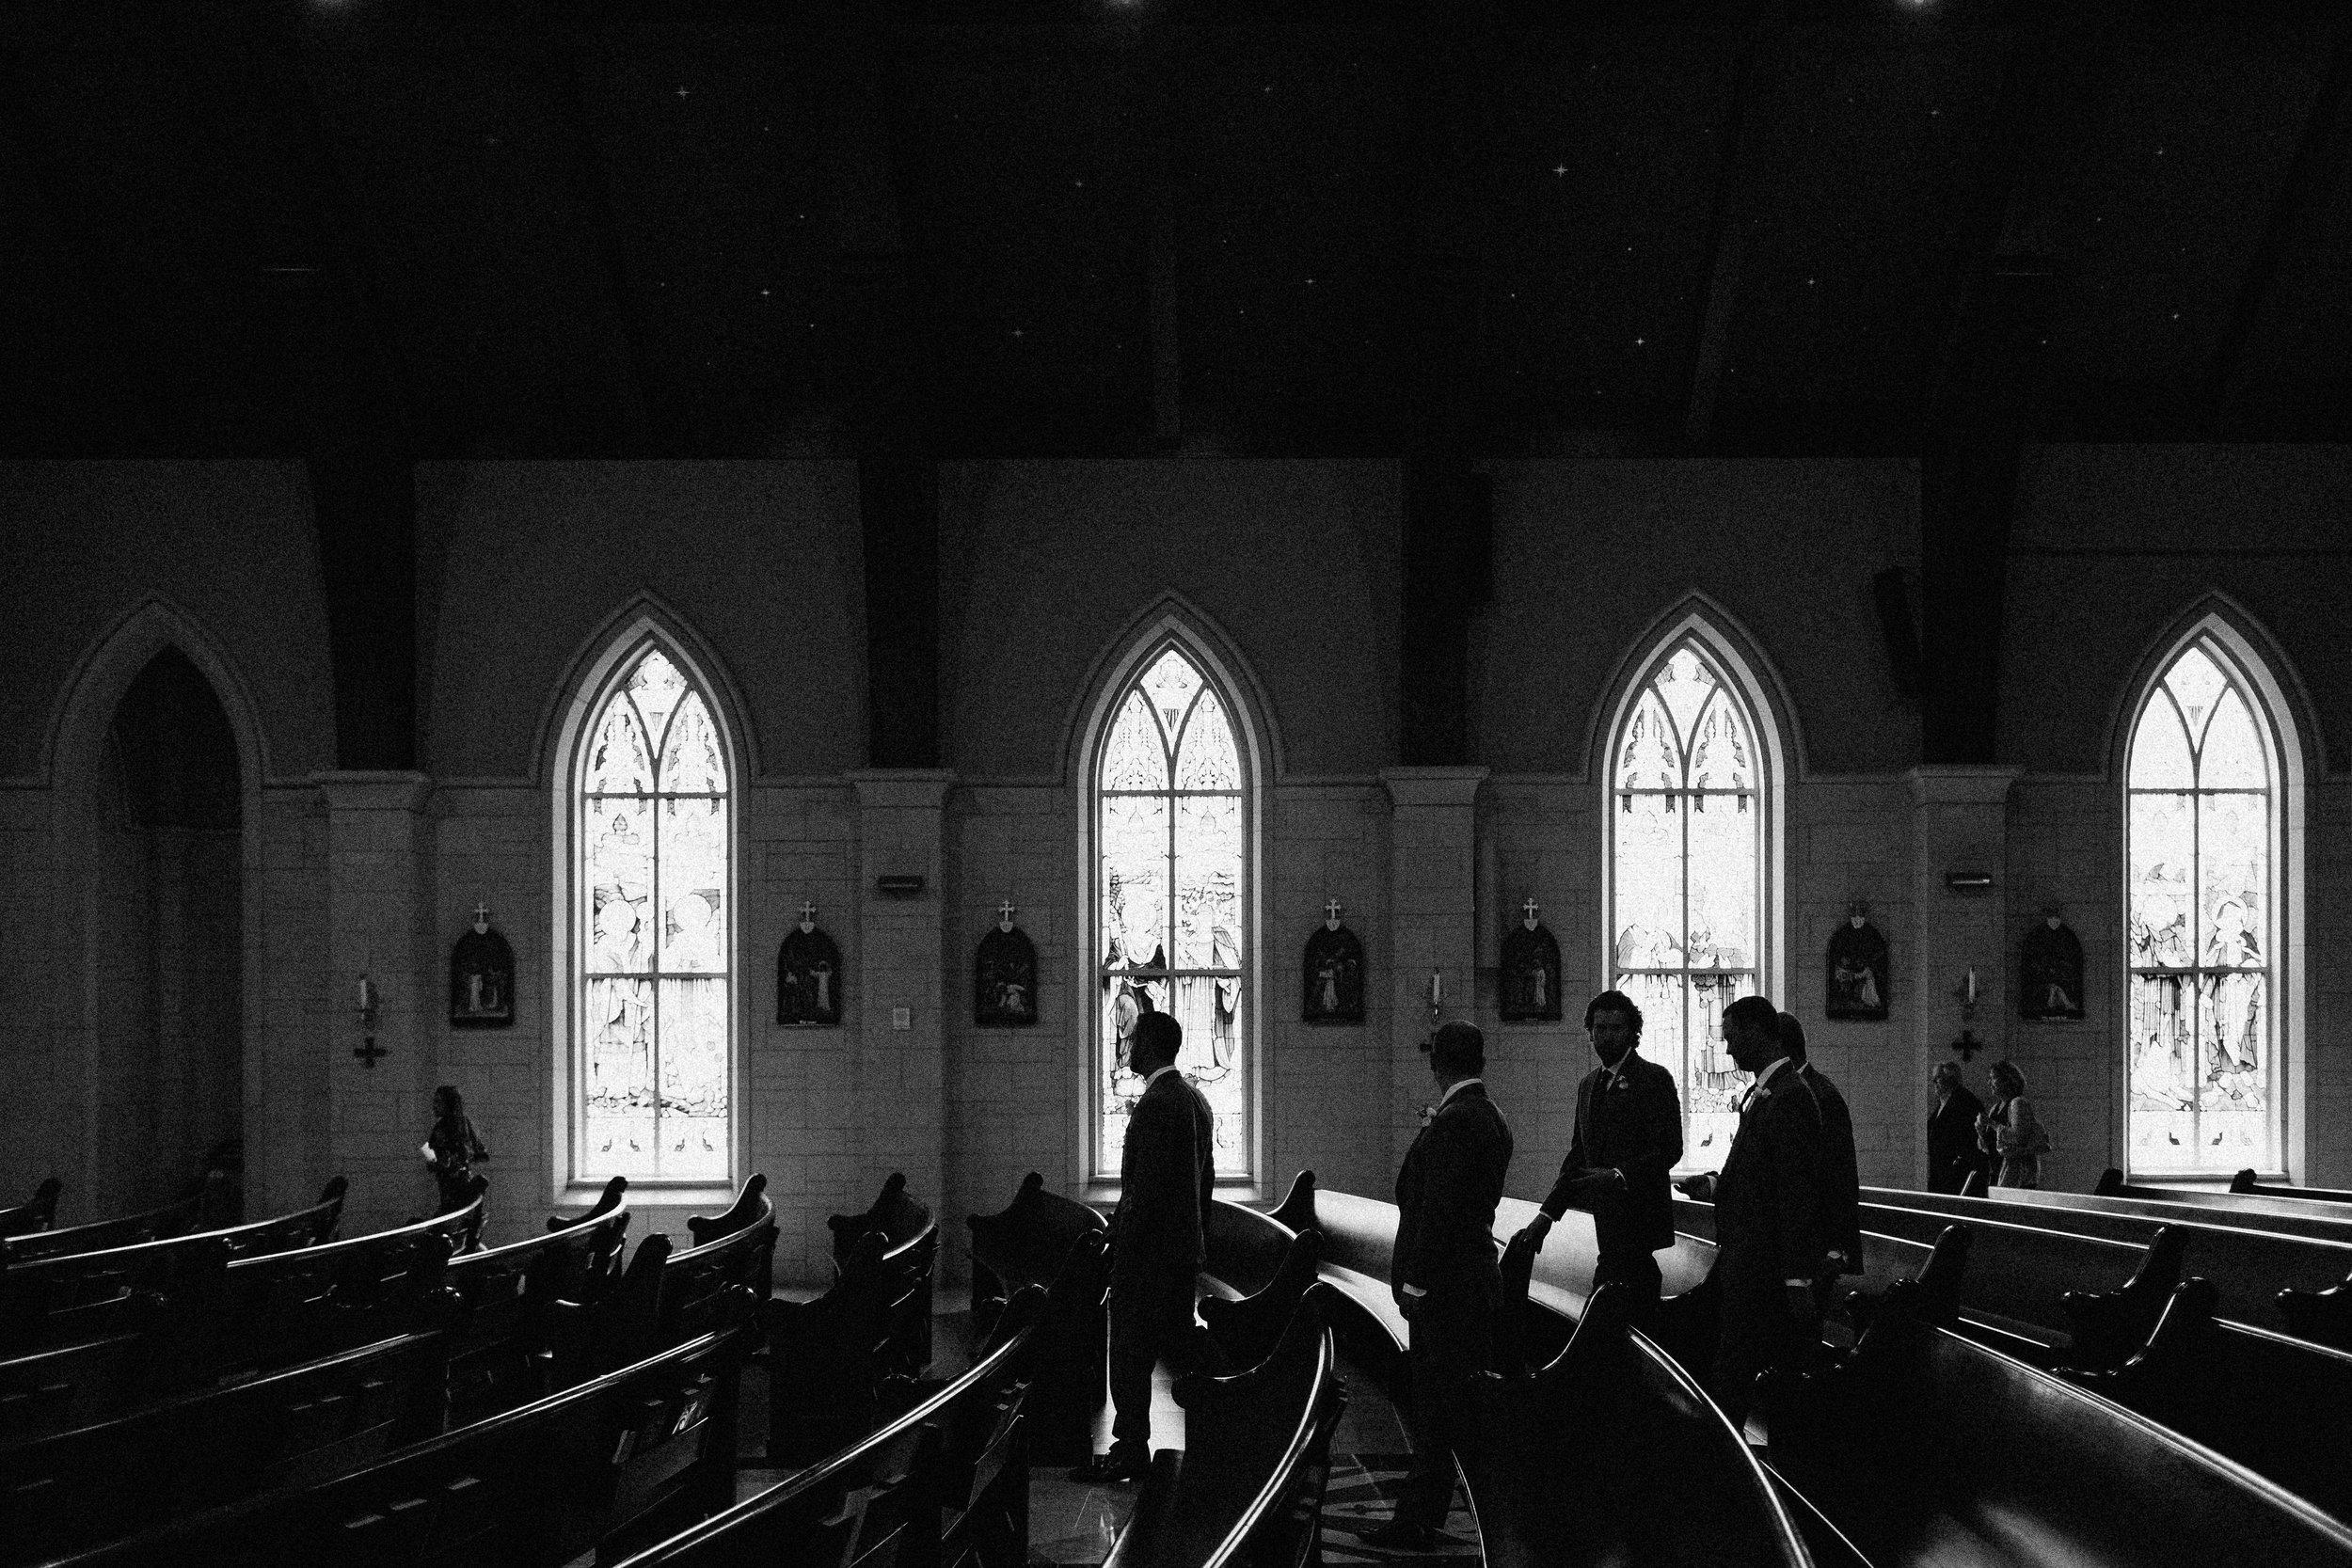 roswell_st_peter_chanel_catholic_avalon_hotel_alpharetta_wedding-1580.jpg